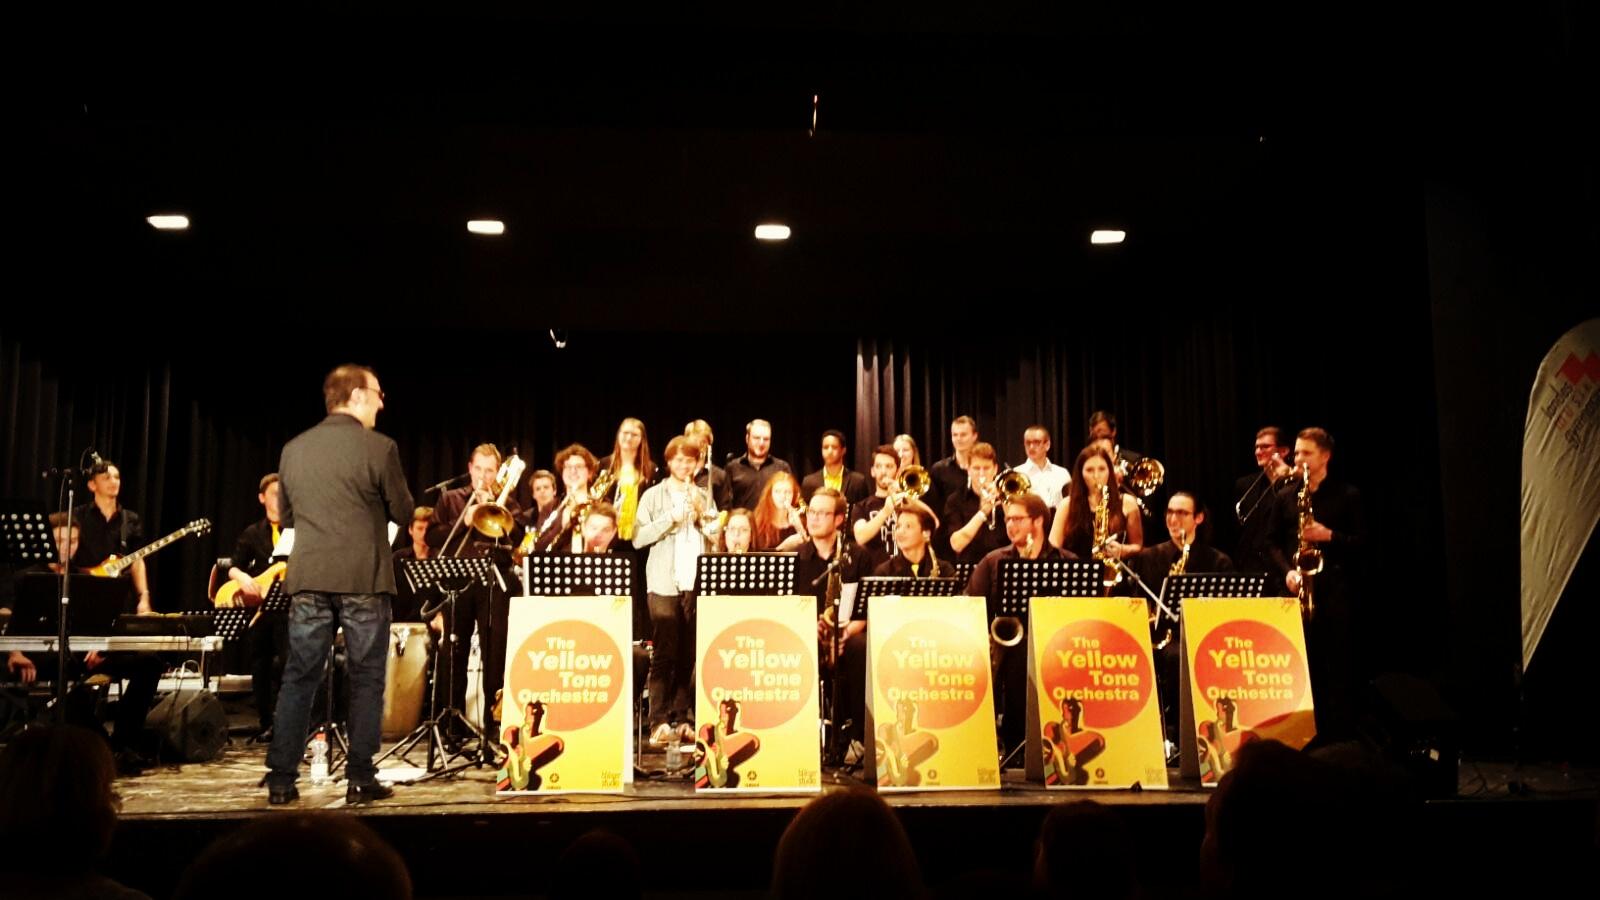 YellowTone_Orchestra